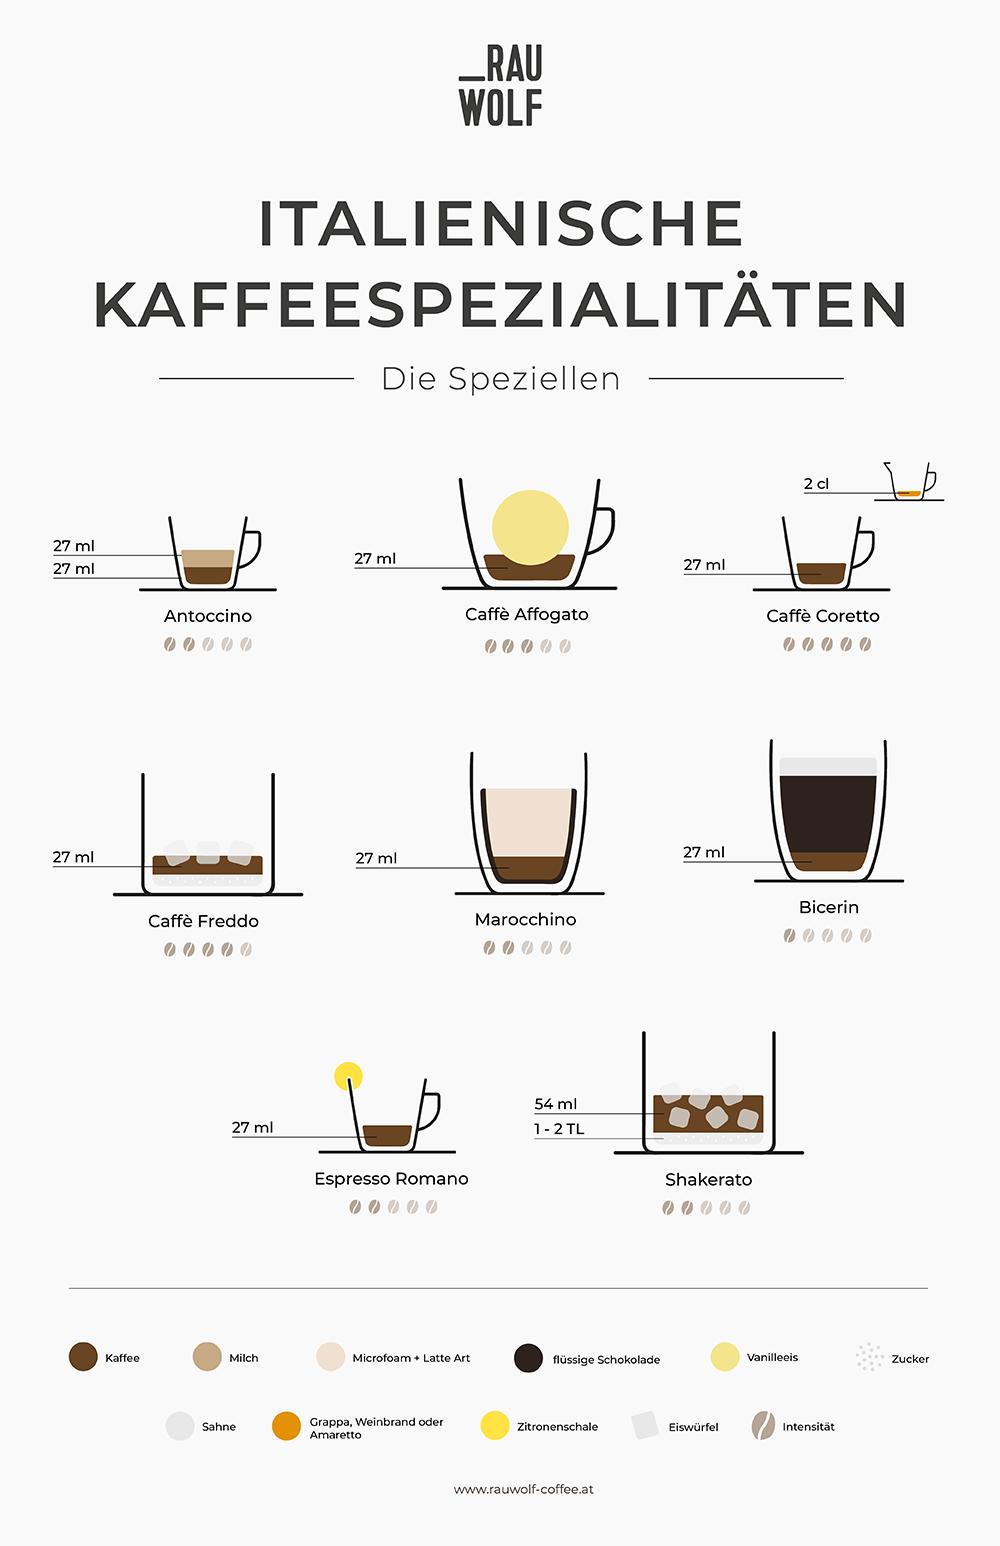 Spezielle Italienische Kaffeespezialitäten zum Ausdrucken